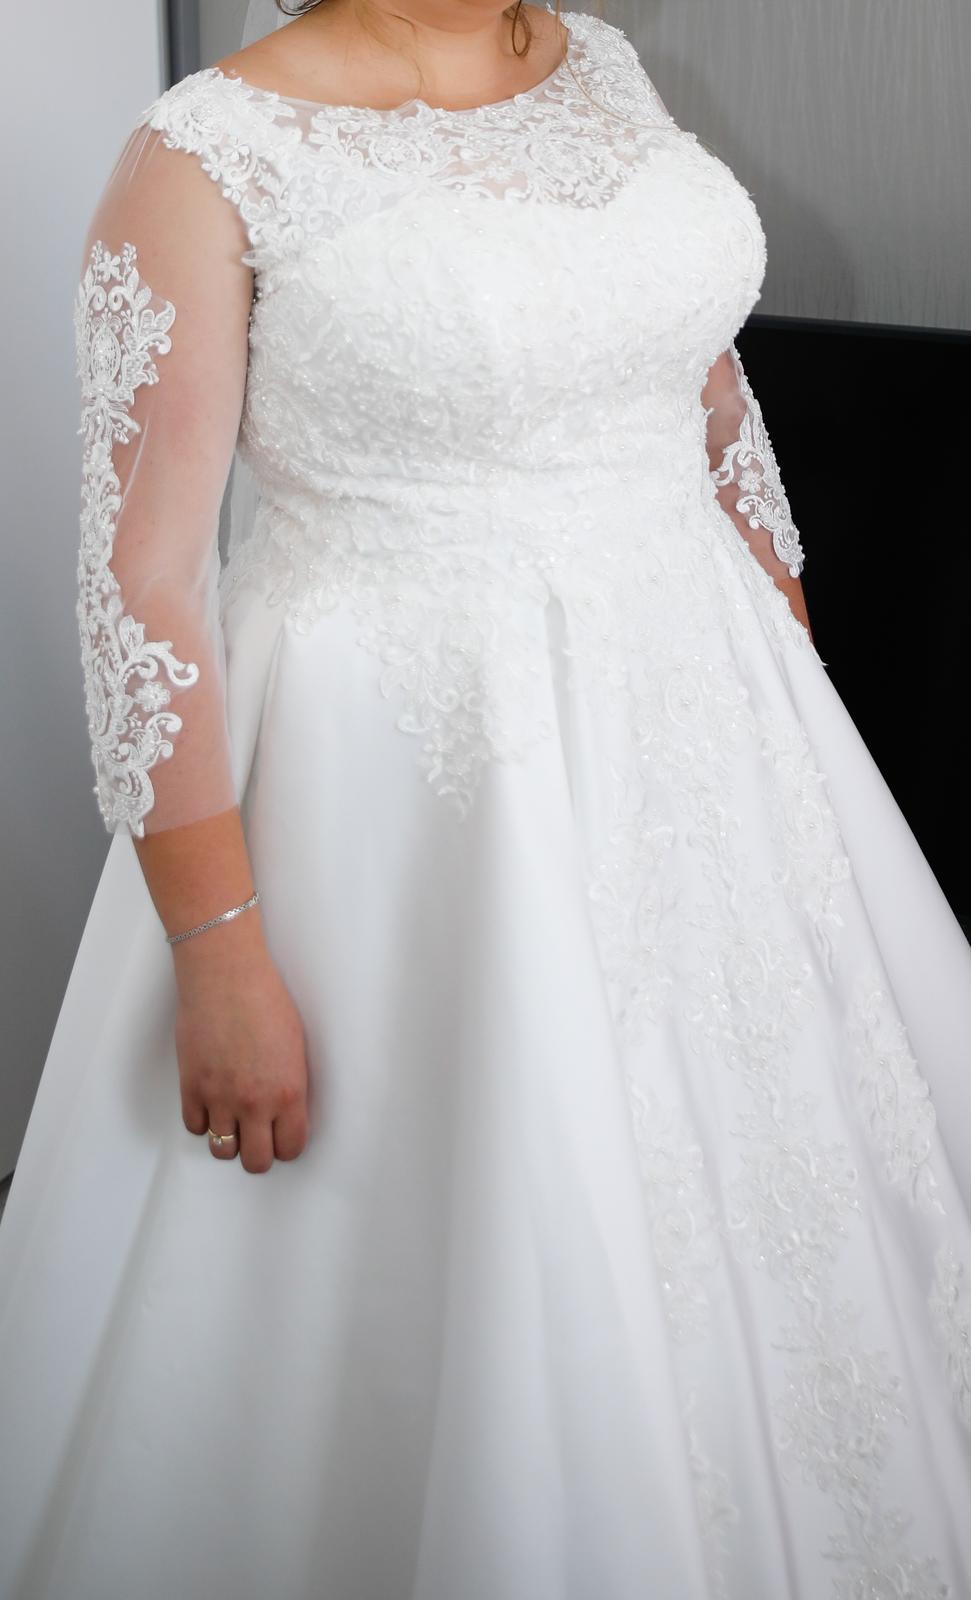 Svadobné šaty satén, čipka 46-50 - Obrázok č. 1